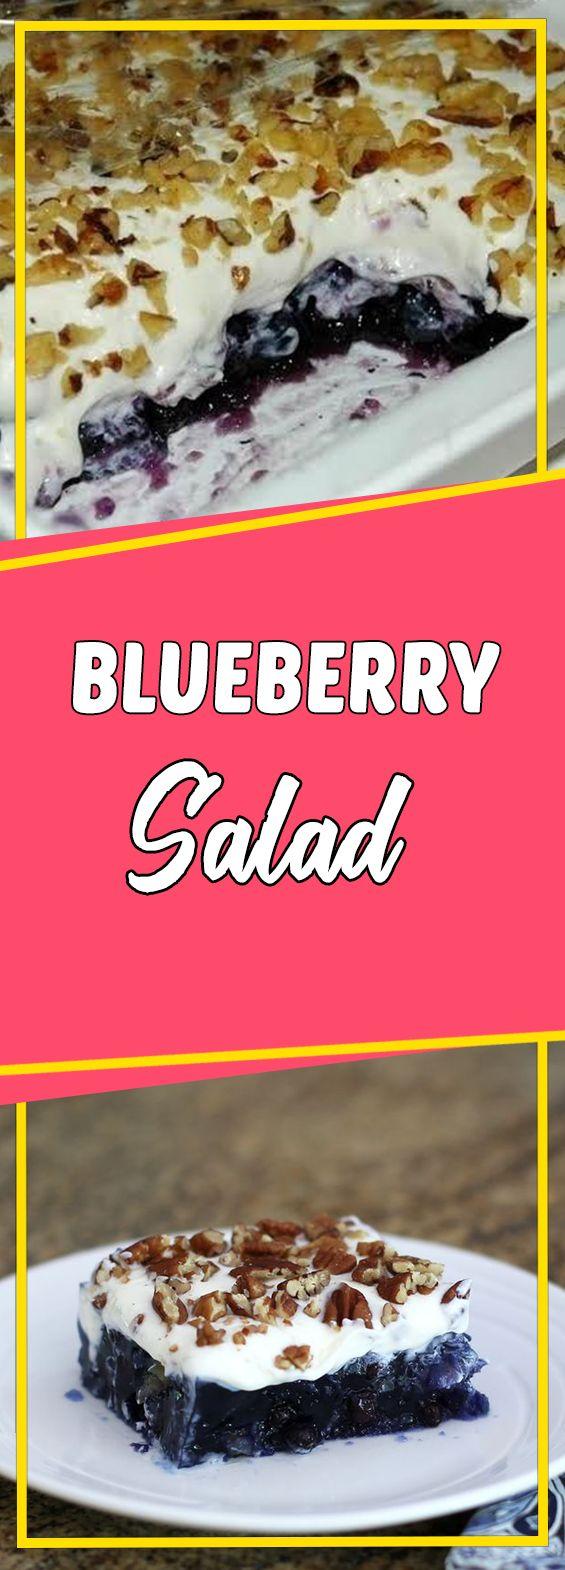 Blueberry Salad #appetizer #recipeoftheday #sundaysupper #dessert #dessertrecipes #desserttable